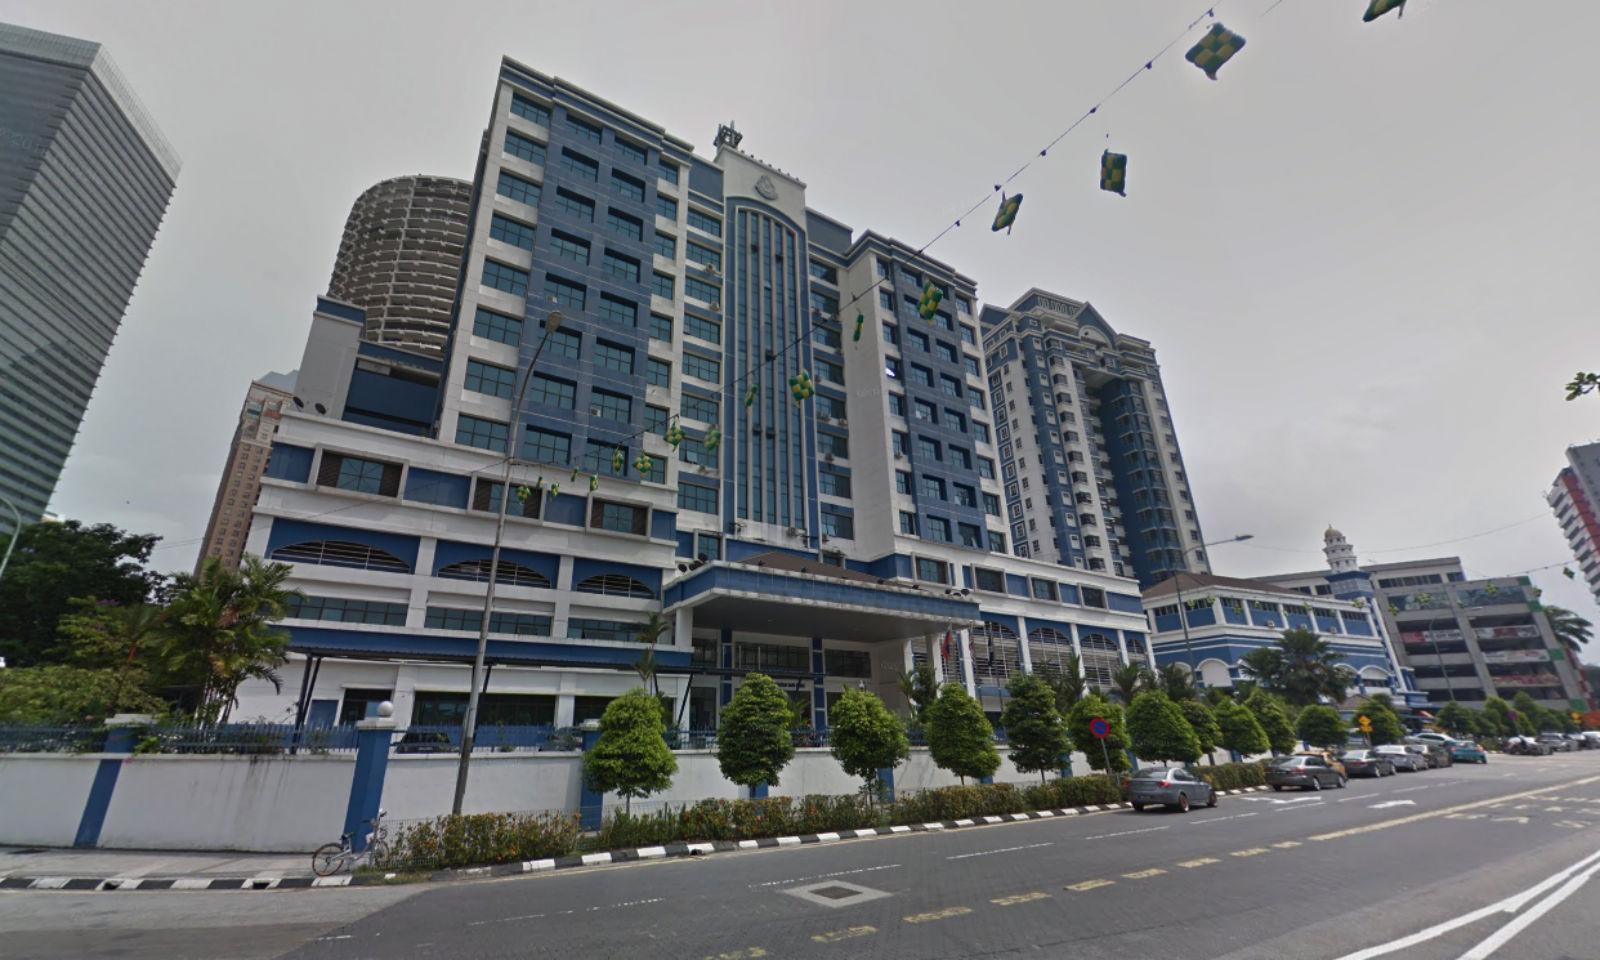 Operasi Judi Online Terbongkar Di Malaysia Asia Times